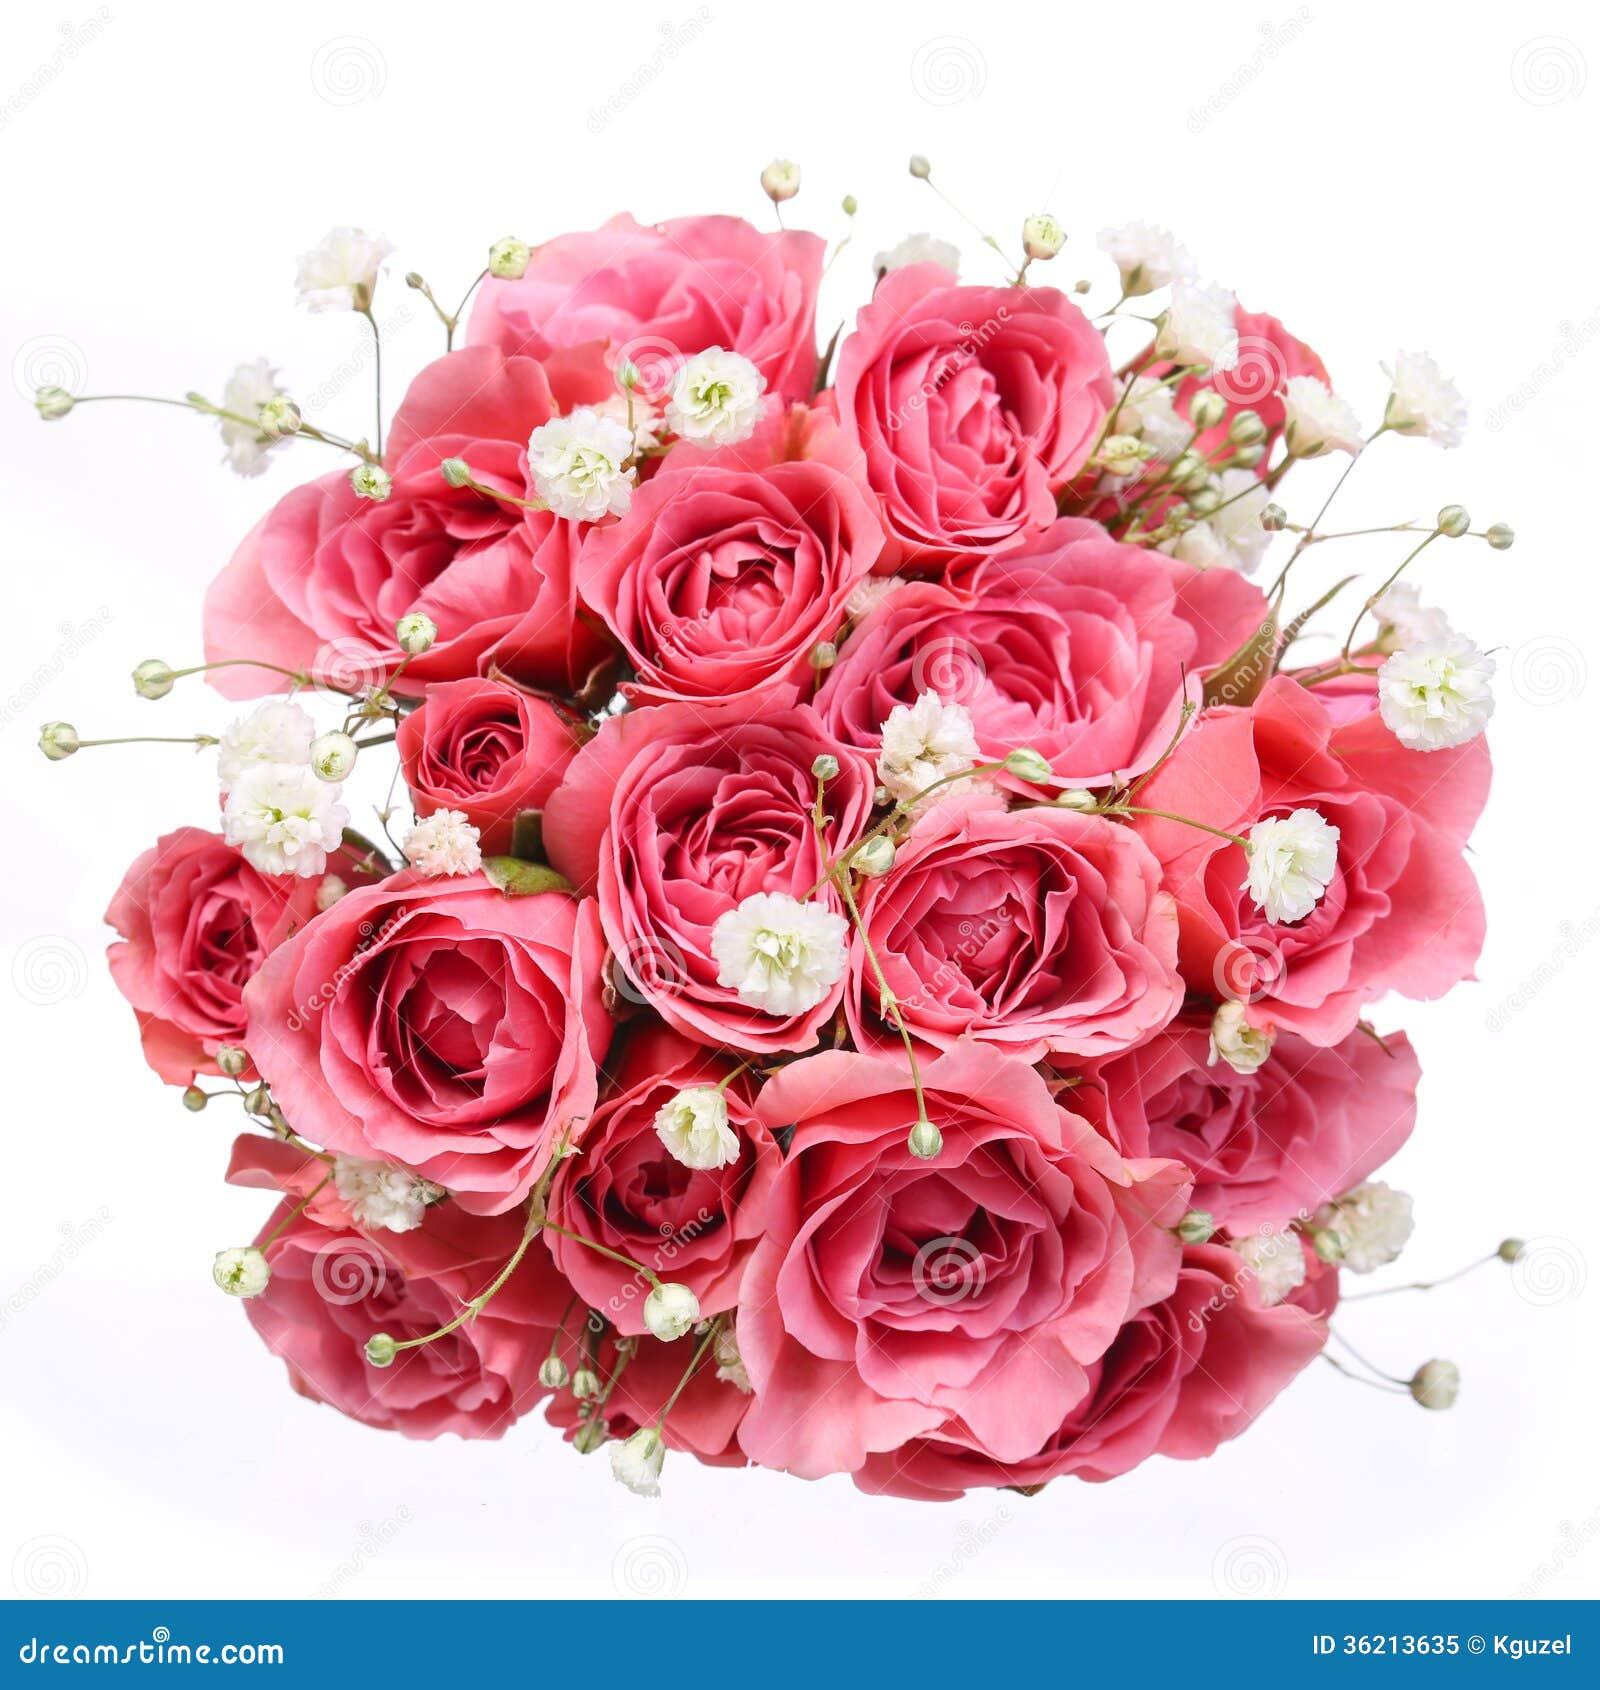 Bouquet of fresh pink roses isolated on white stock photo image of bouquet of pink roses isolated on white background bridal royalty free stock photo izmirmasajfo